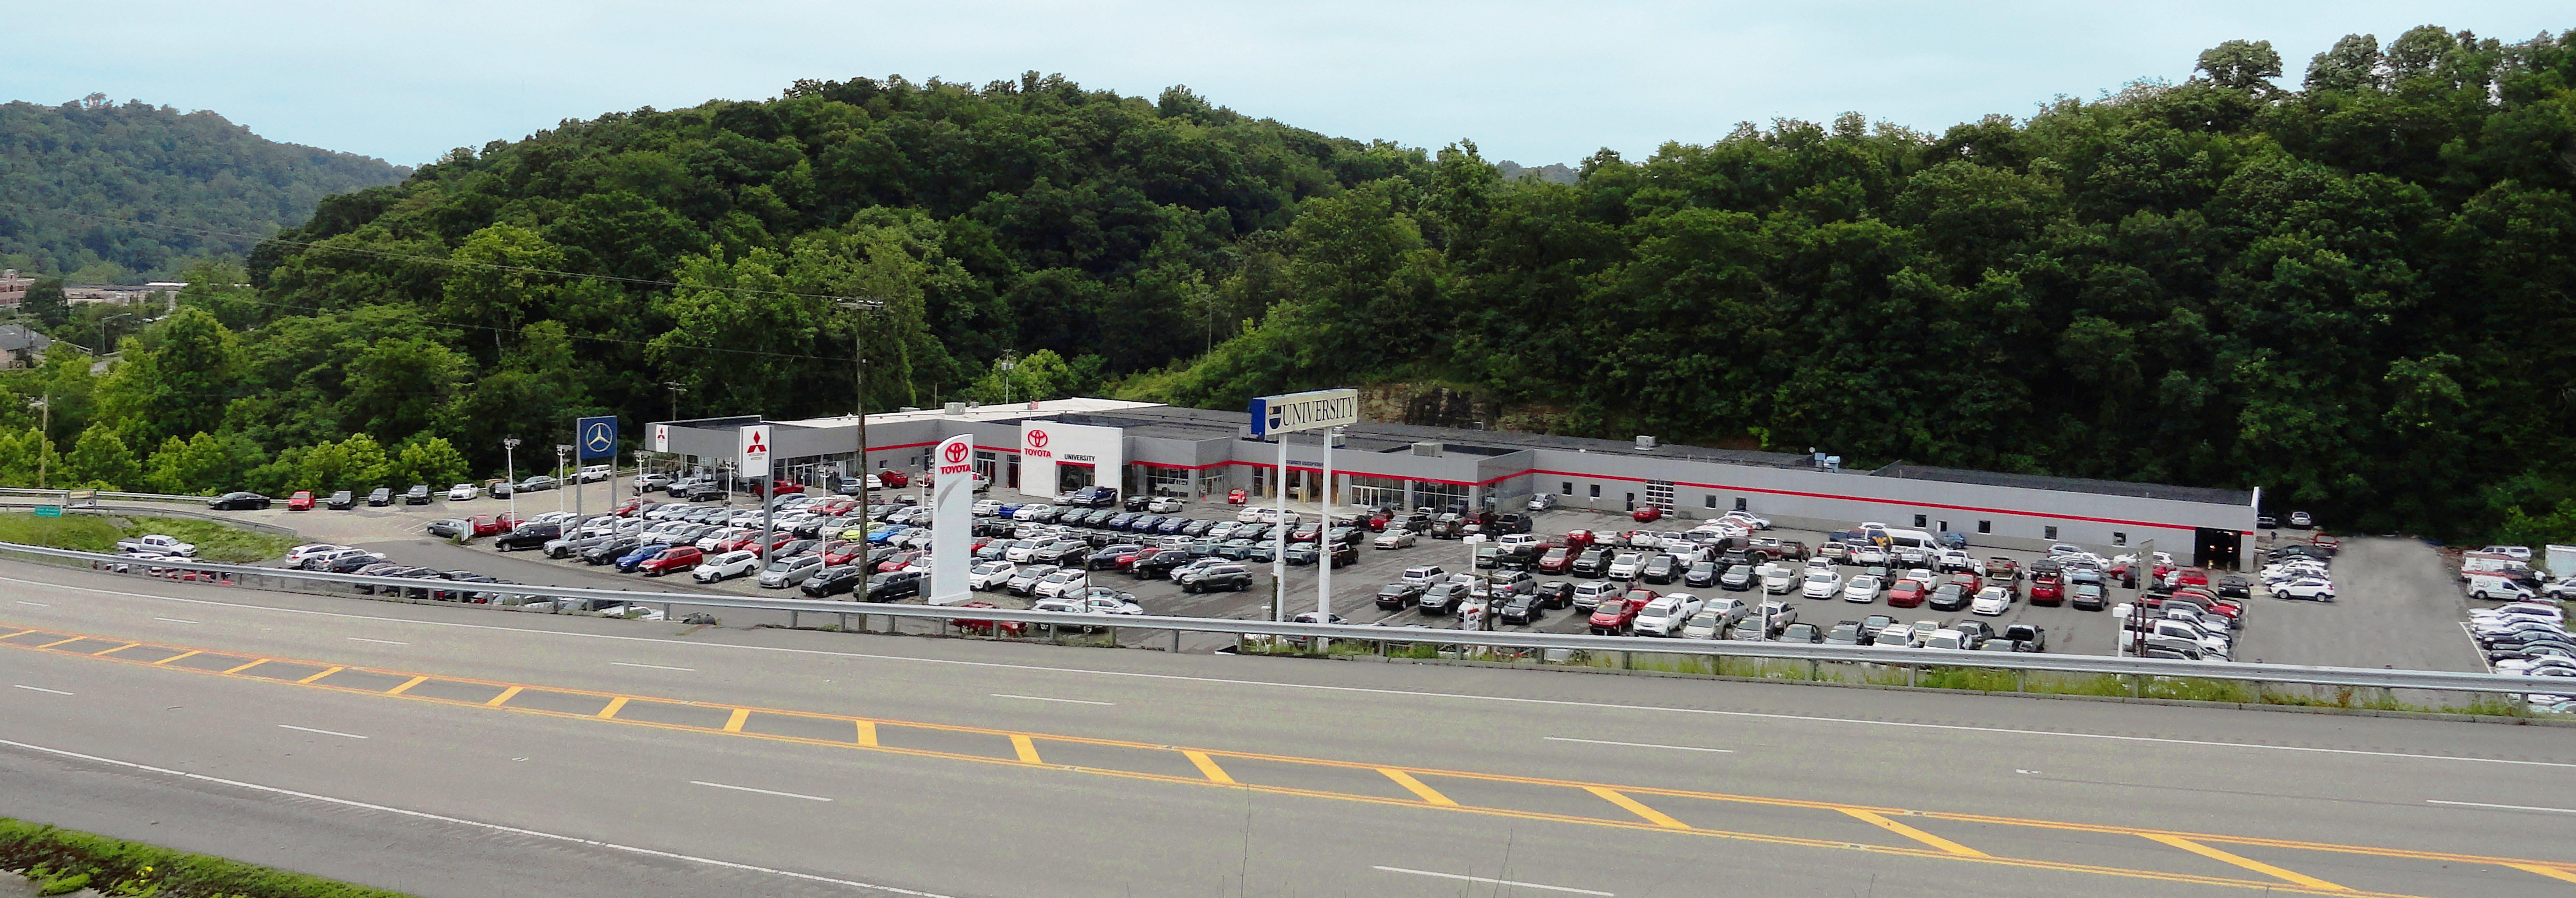 University Of Toyota >> About University Toyota Serving Morgantown Wv Cumberland Md